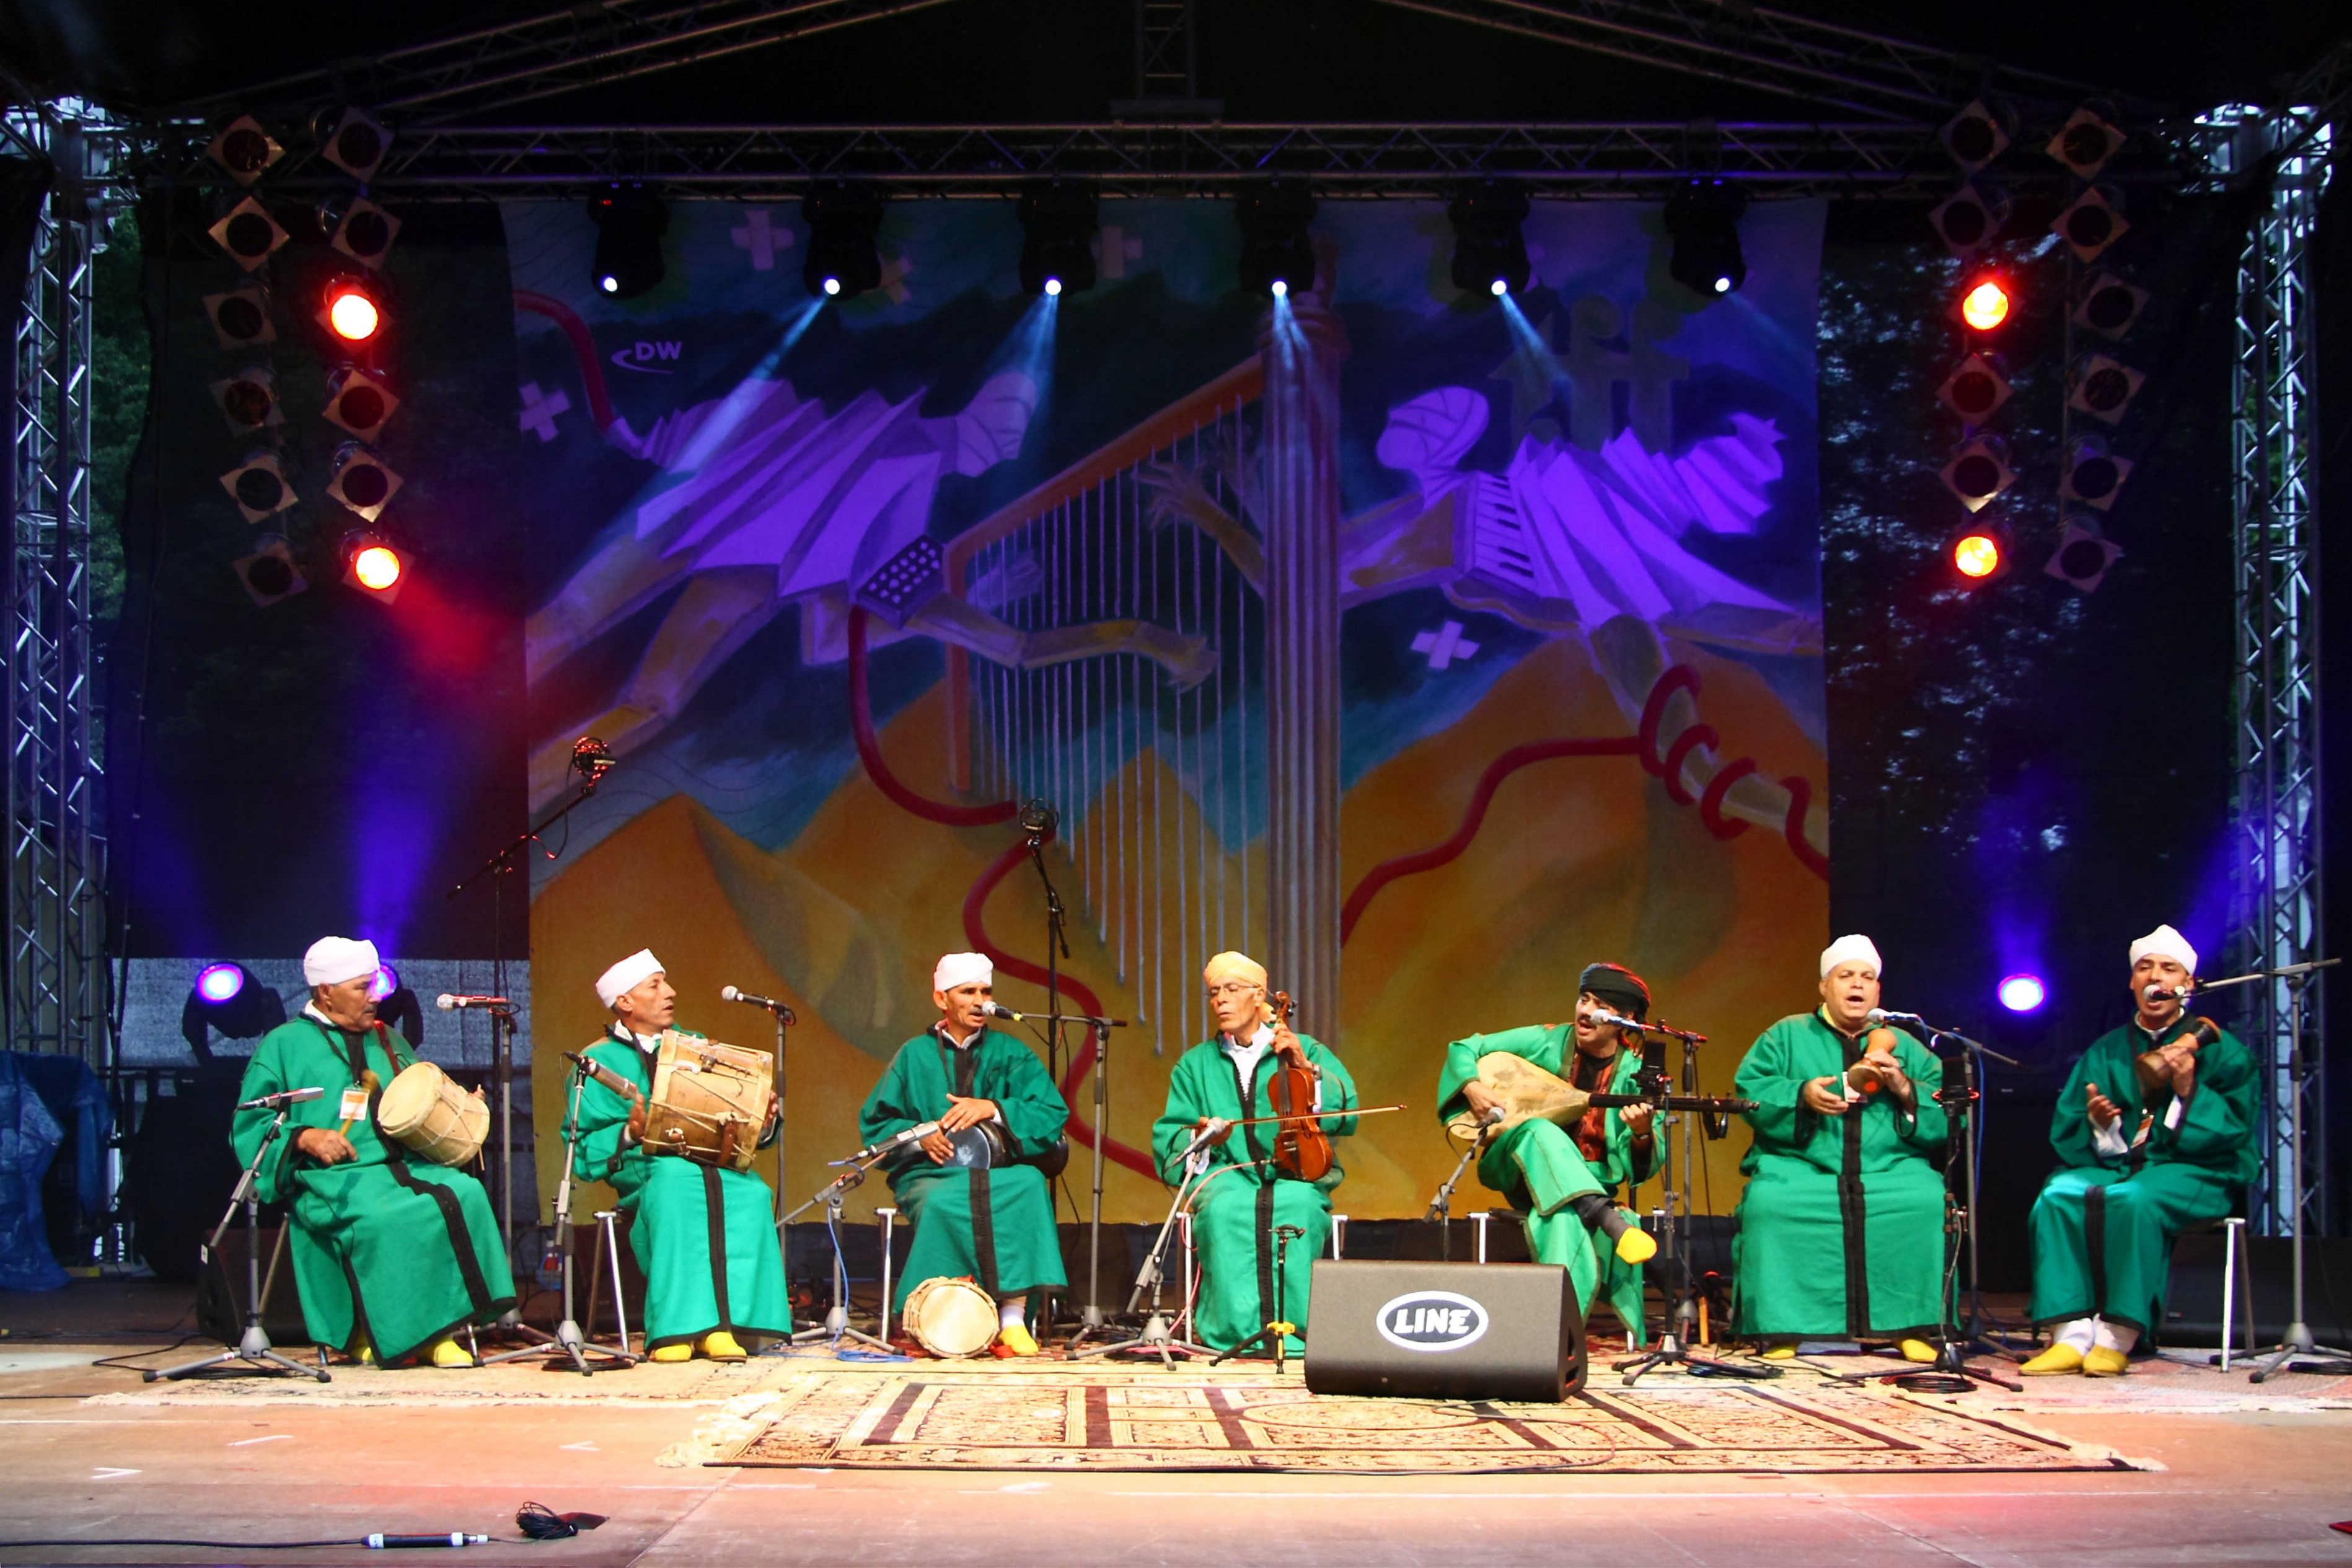 https://upload.wikimedia.org/wikipedia/commons/e/ee/Master_Musicians_of_Jajouka_led_by_Bachir_Attar.jpg